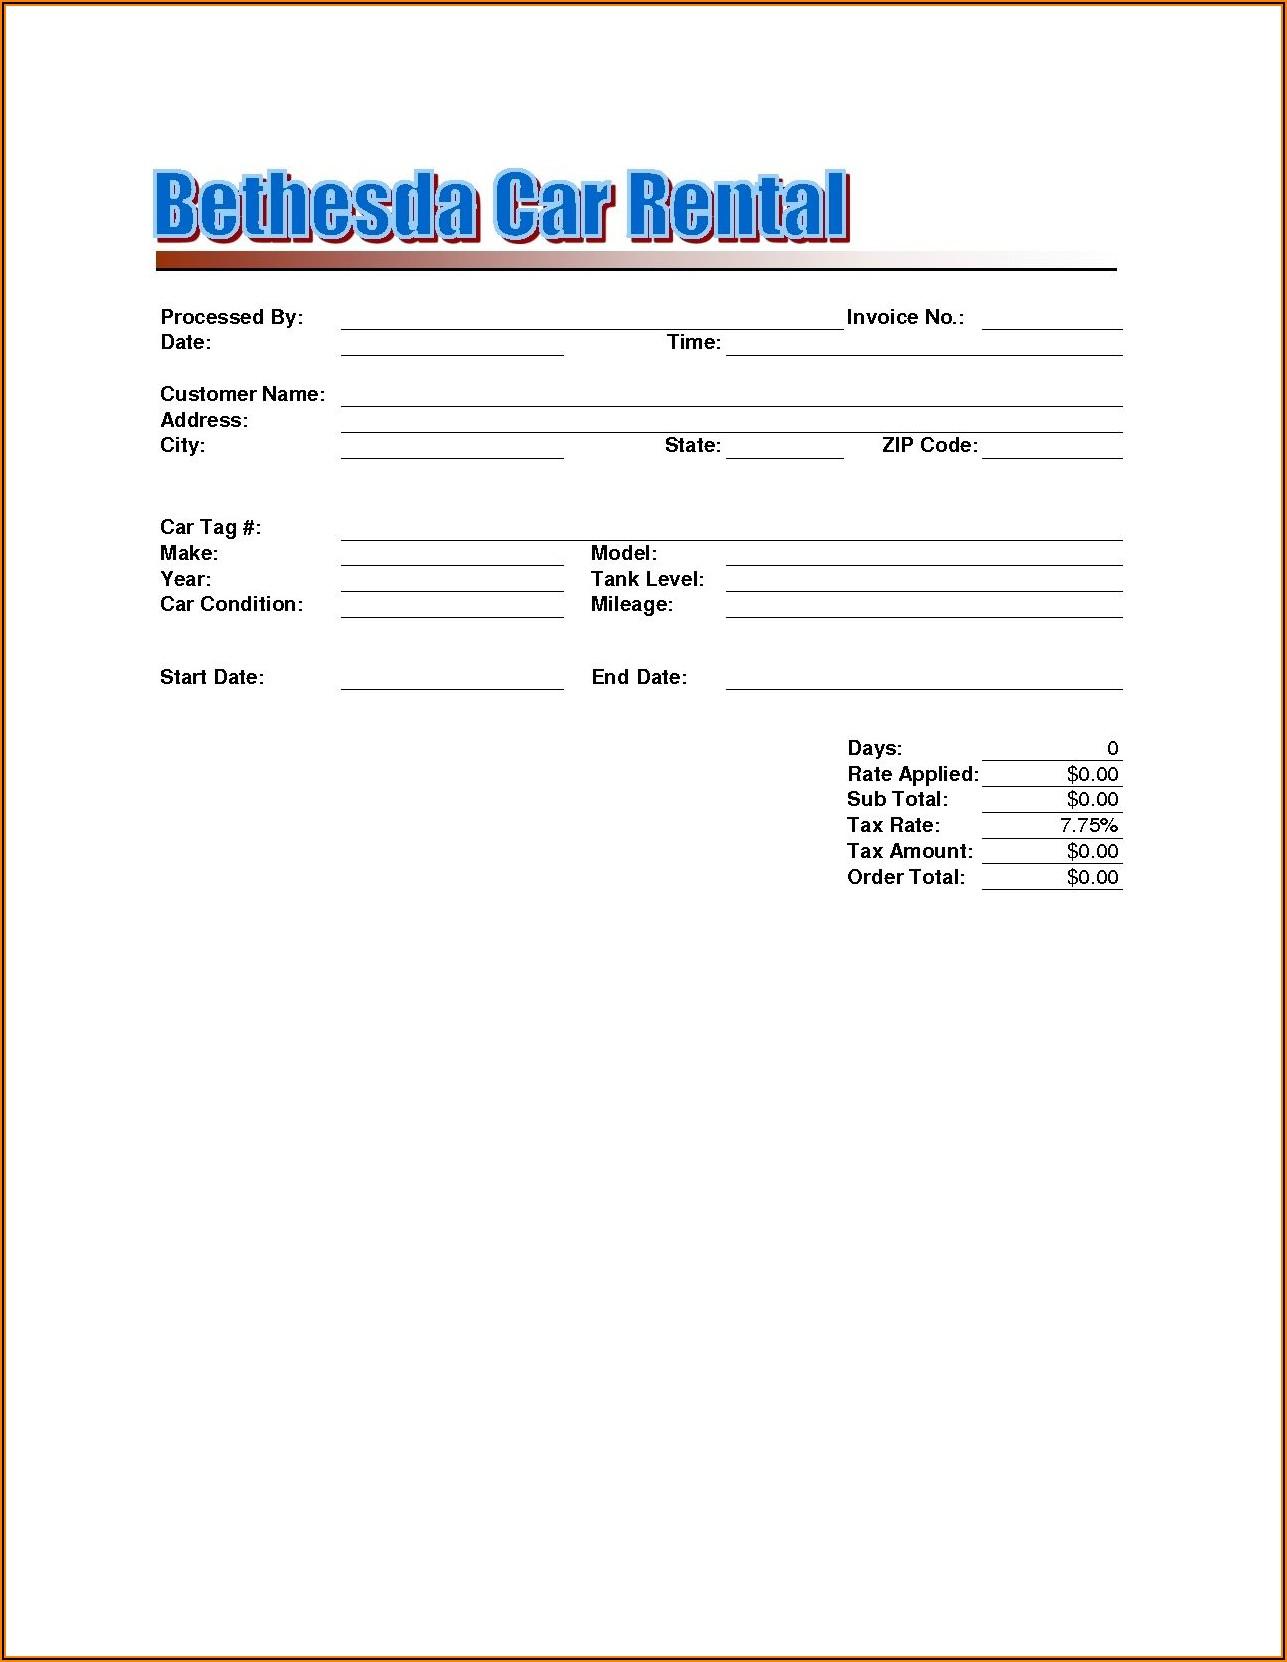 Car Rental Receipts Templates